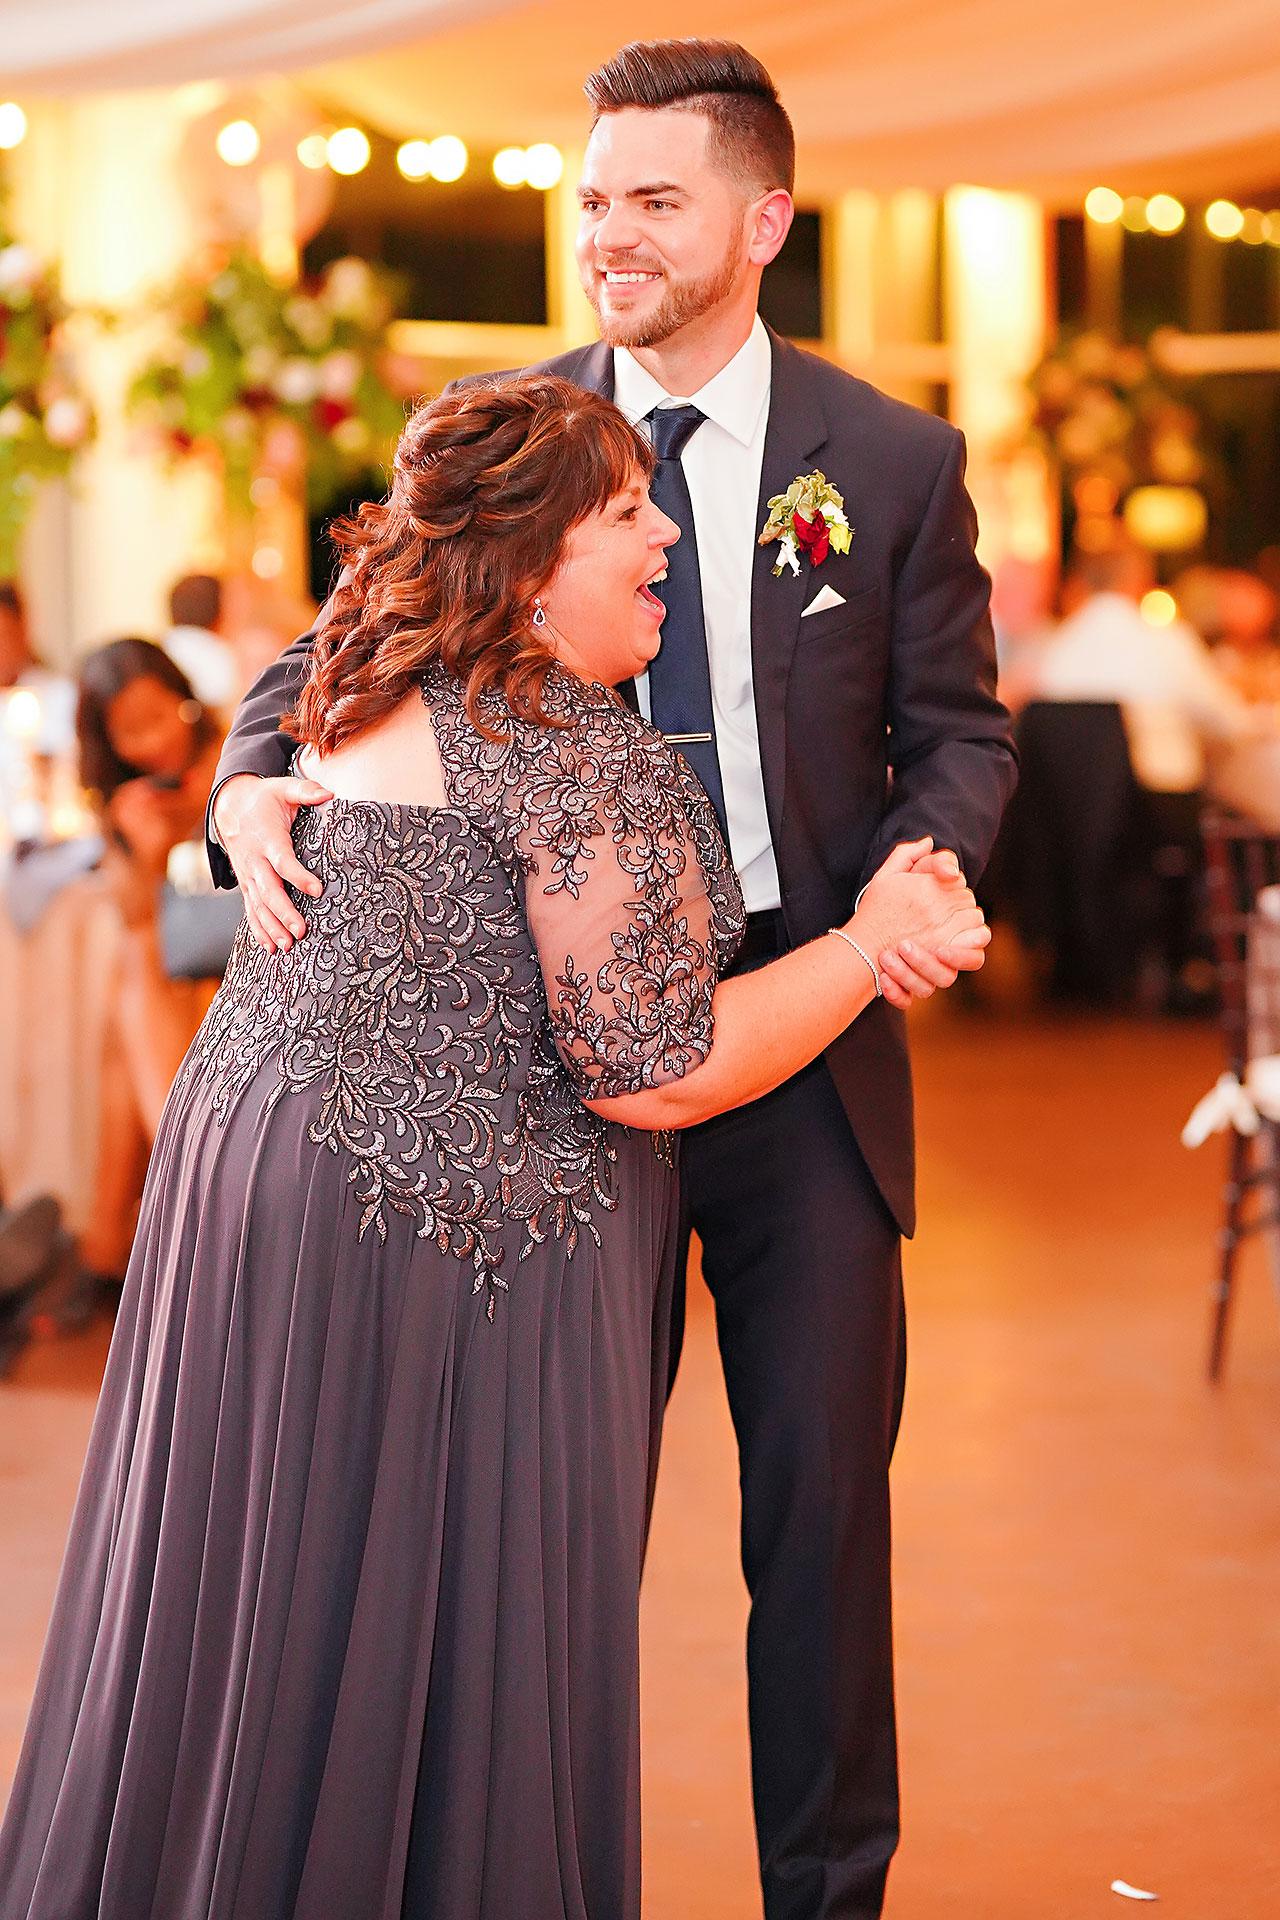 Callie Josh Ritz Charles Garden Pavilion Carmel Indiana Wedding 306